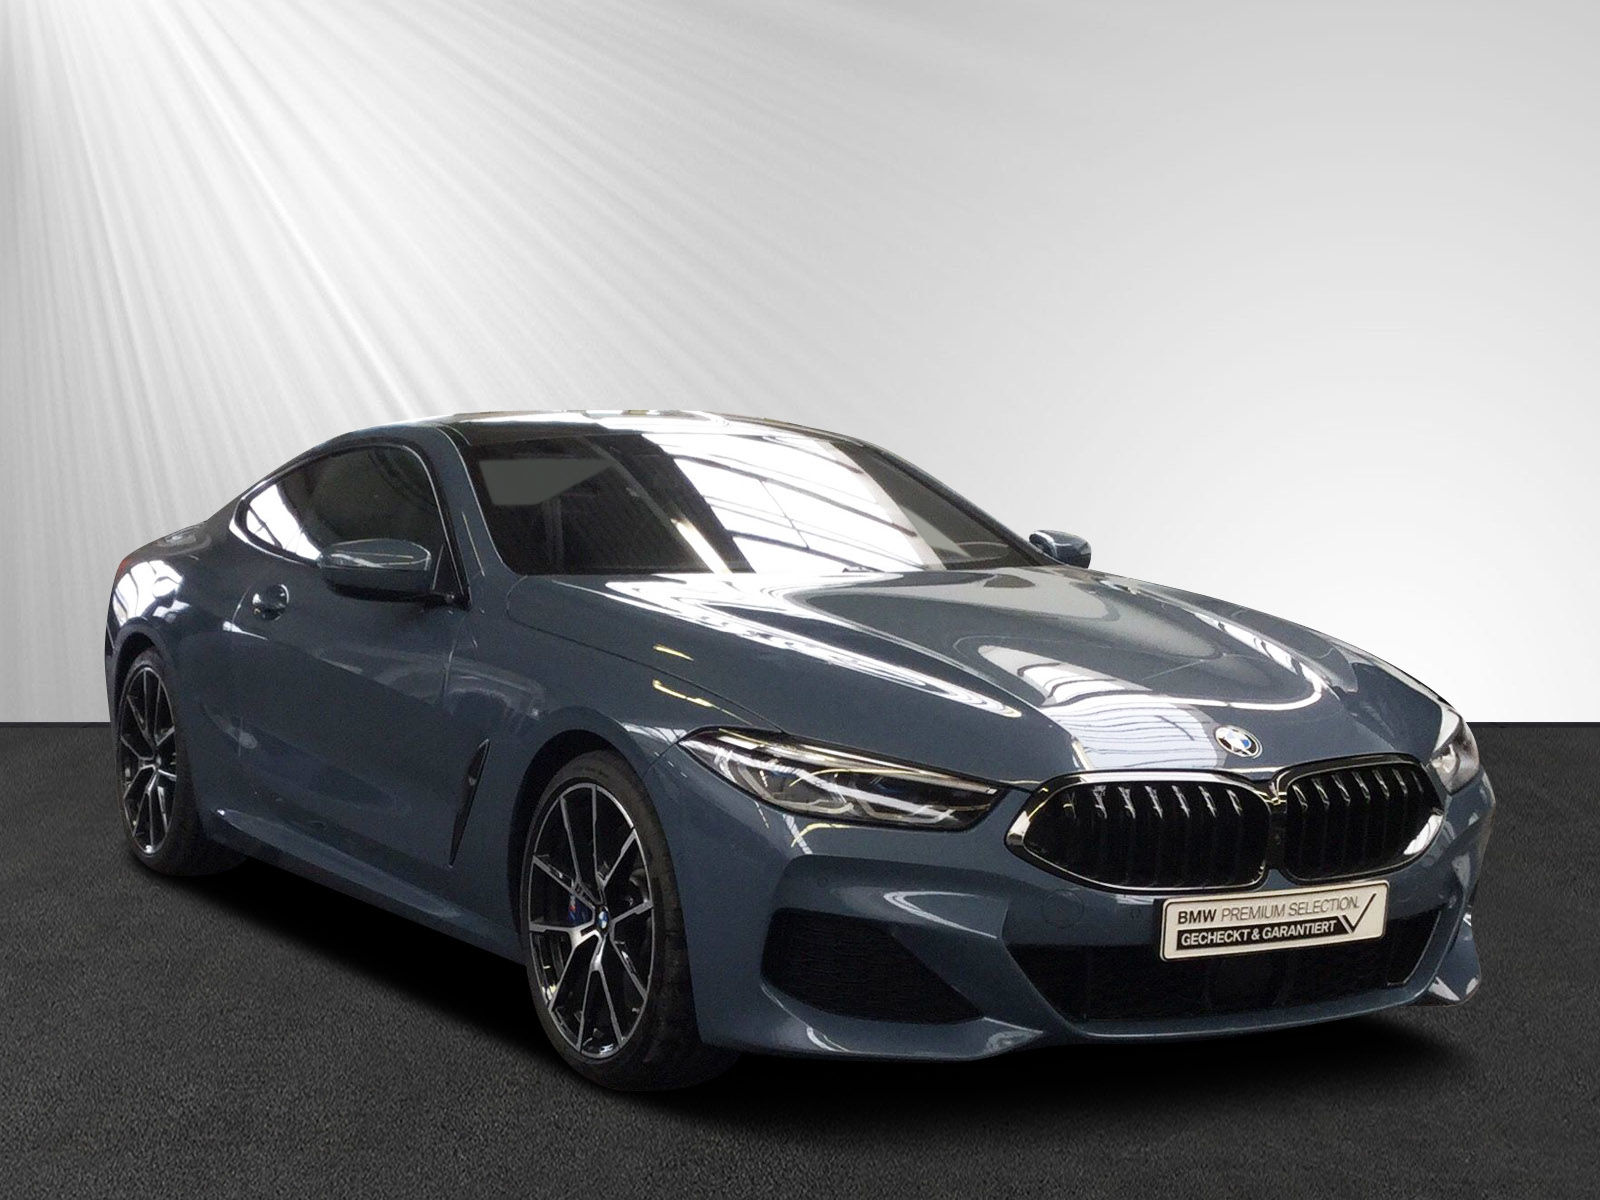 BMW 840d xDrive Coupe 20'' MSport Carbondach Laser, Jahr 2018, diesel